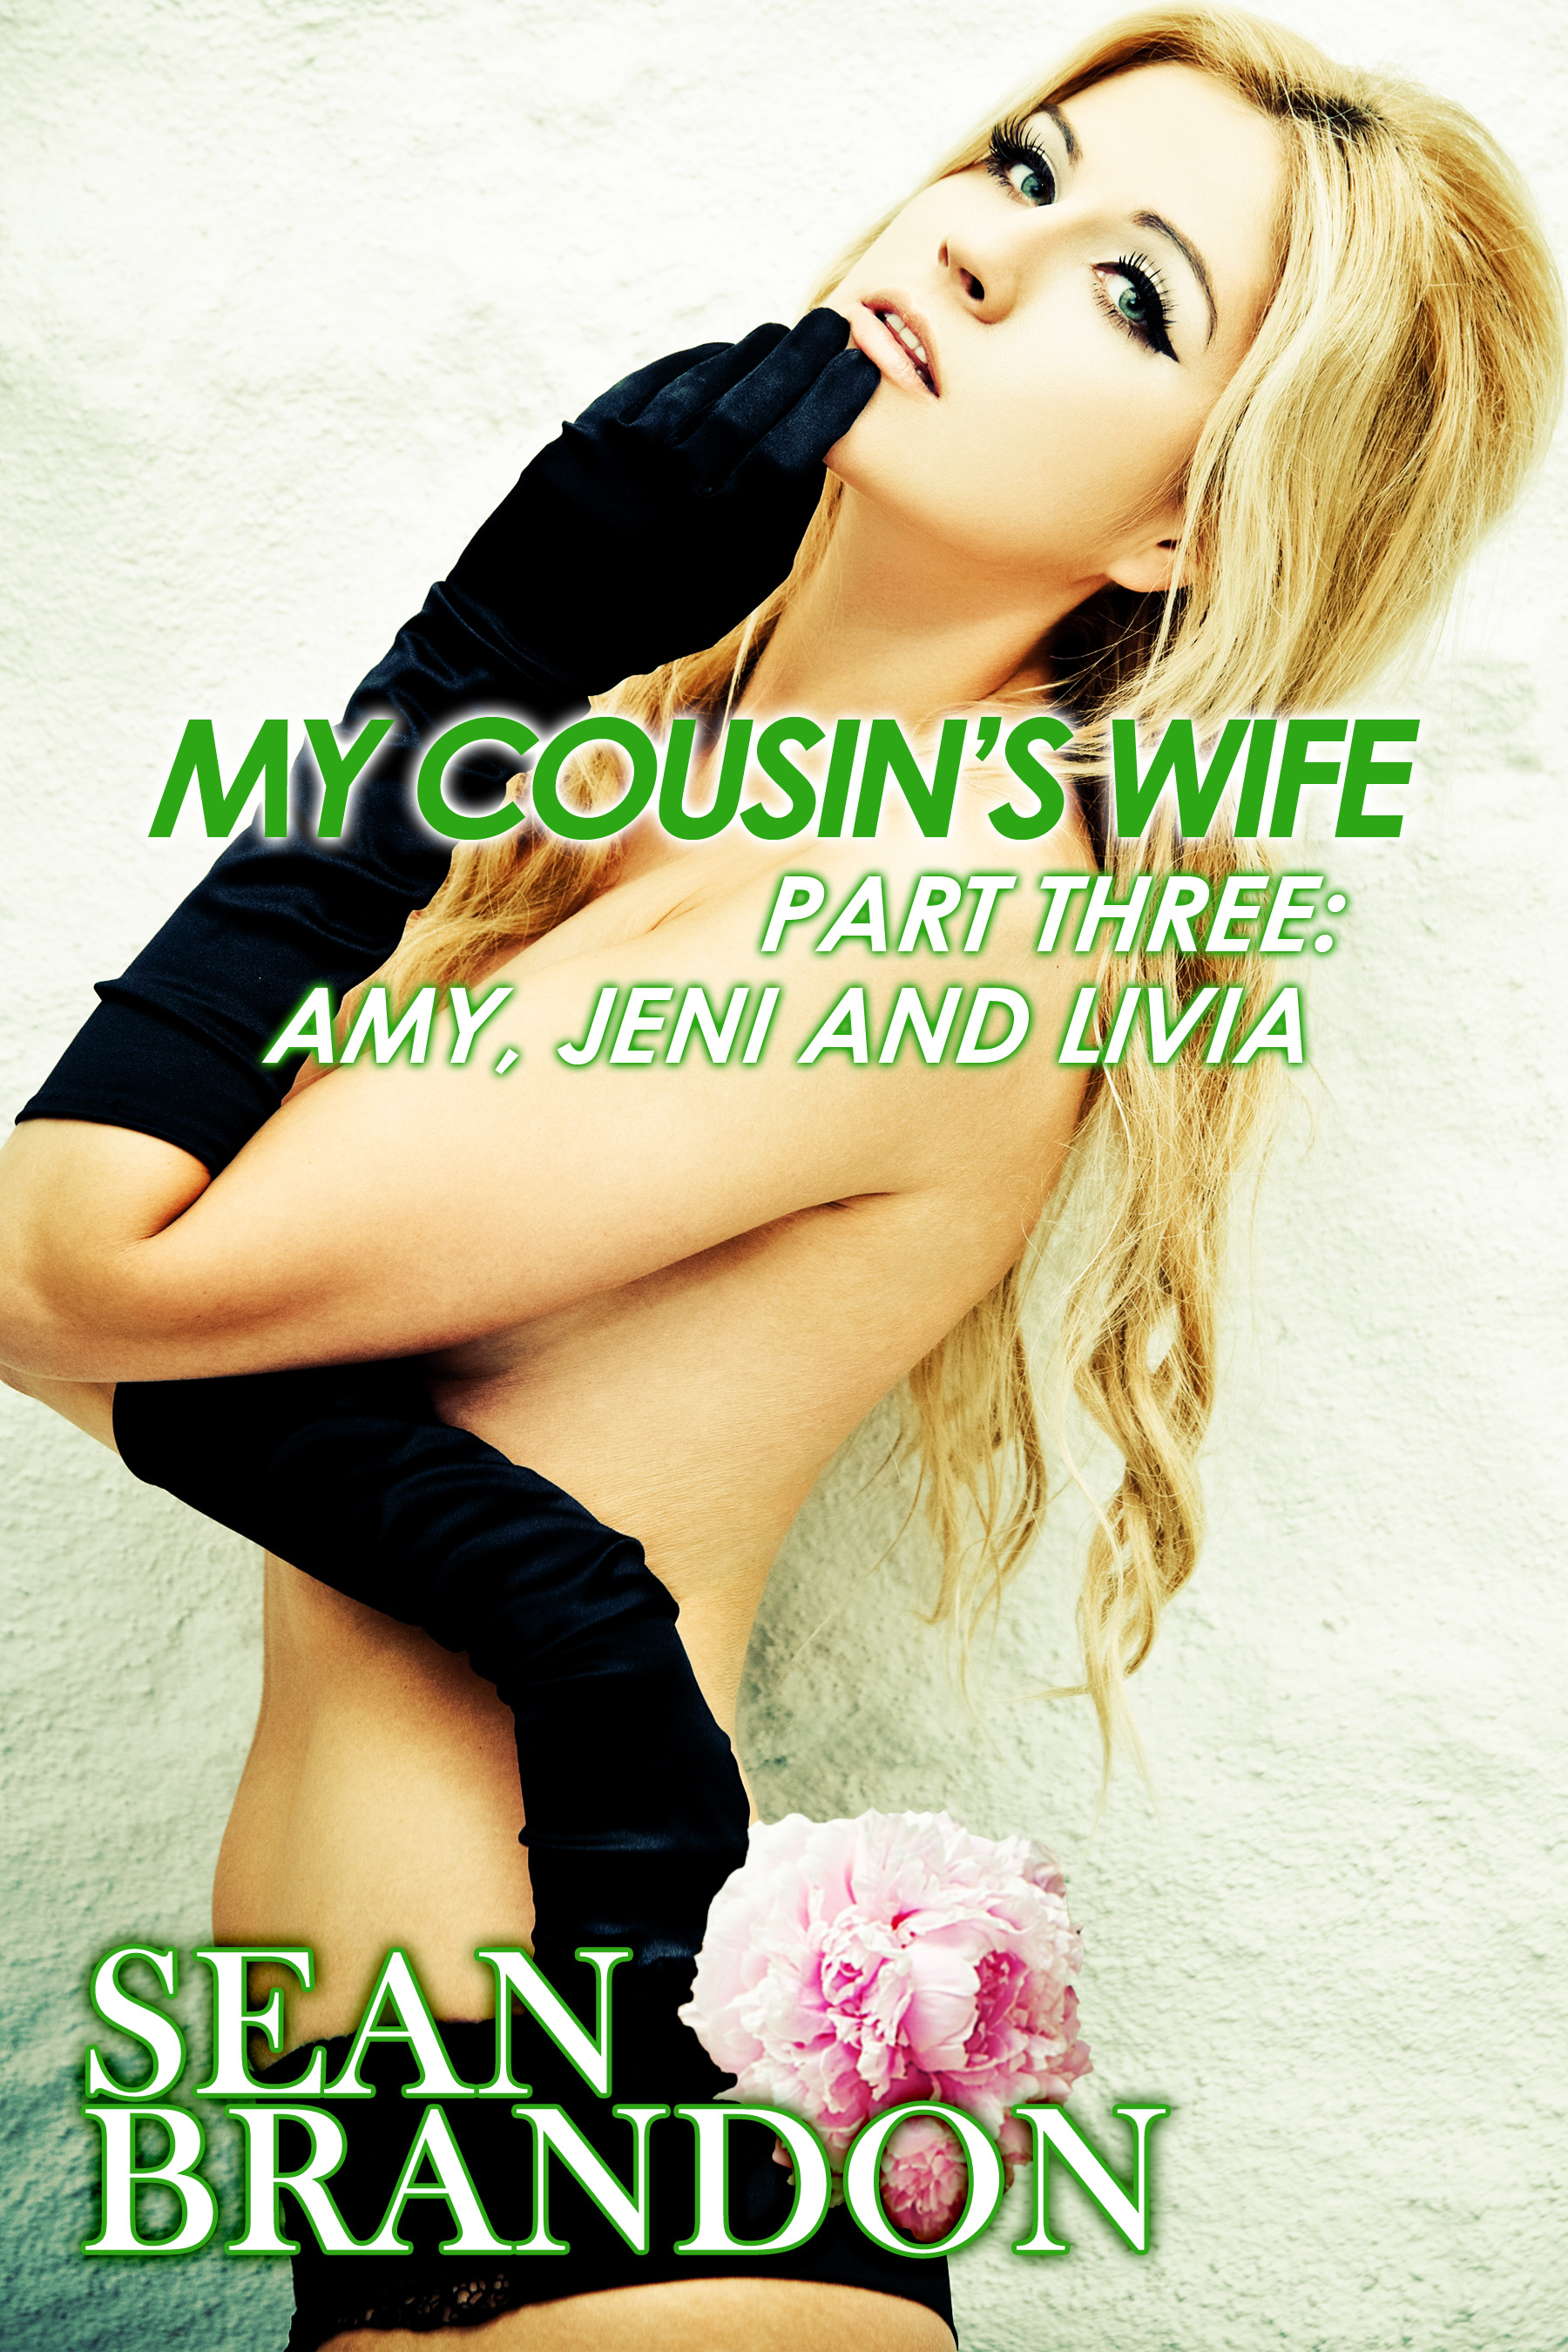 Sean Brandon - My Cousin's Wife Part Three: Amy, Jeni and Livia